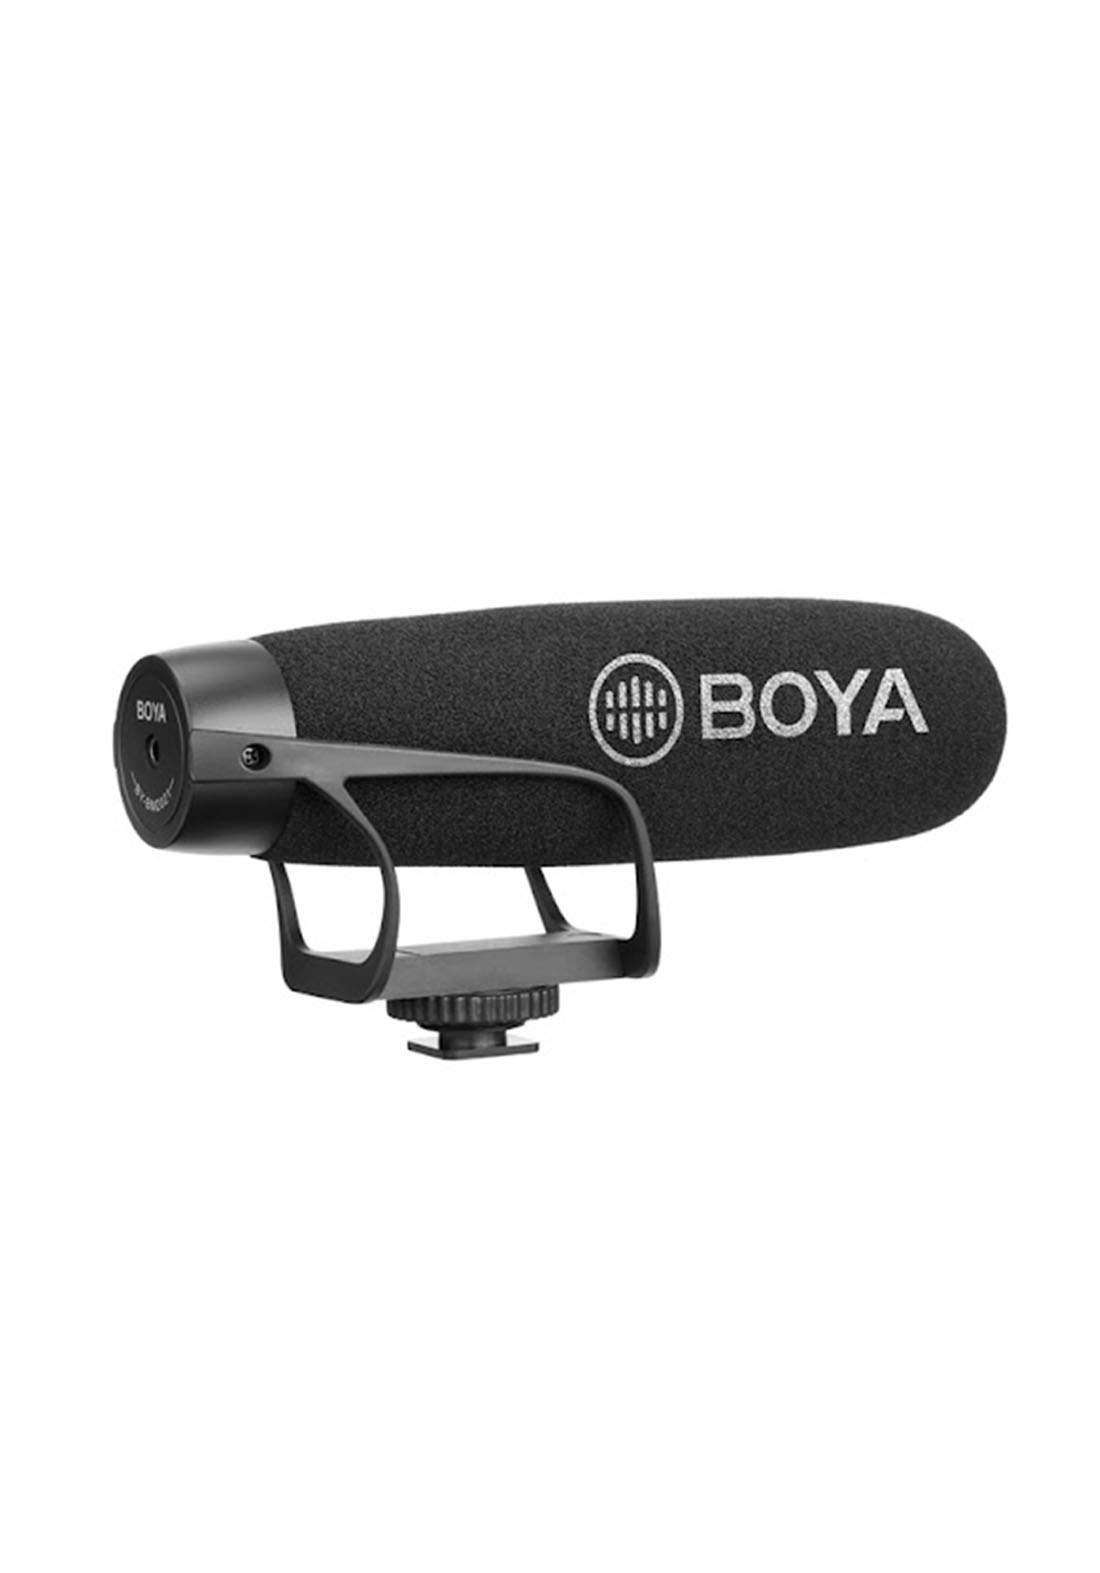 Boya BY-BM2021 Super-Cardioid Shotgun Microphone - Black مايكروفون